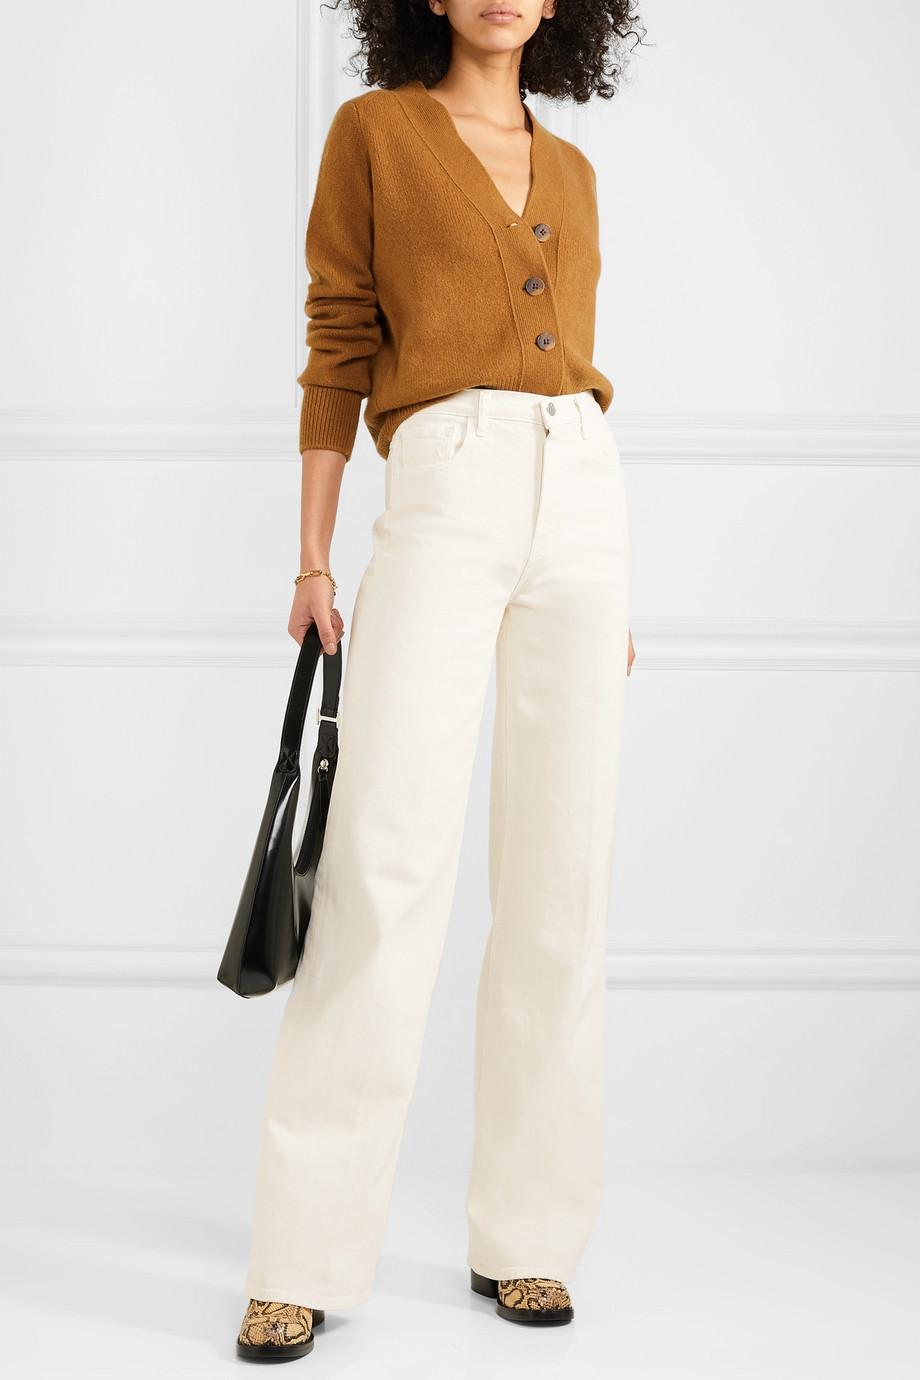 J Brand + Elsa Hosk Monday high-rise wide-leg jeans